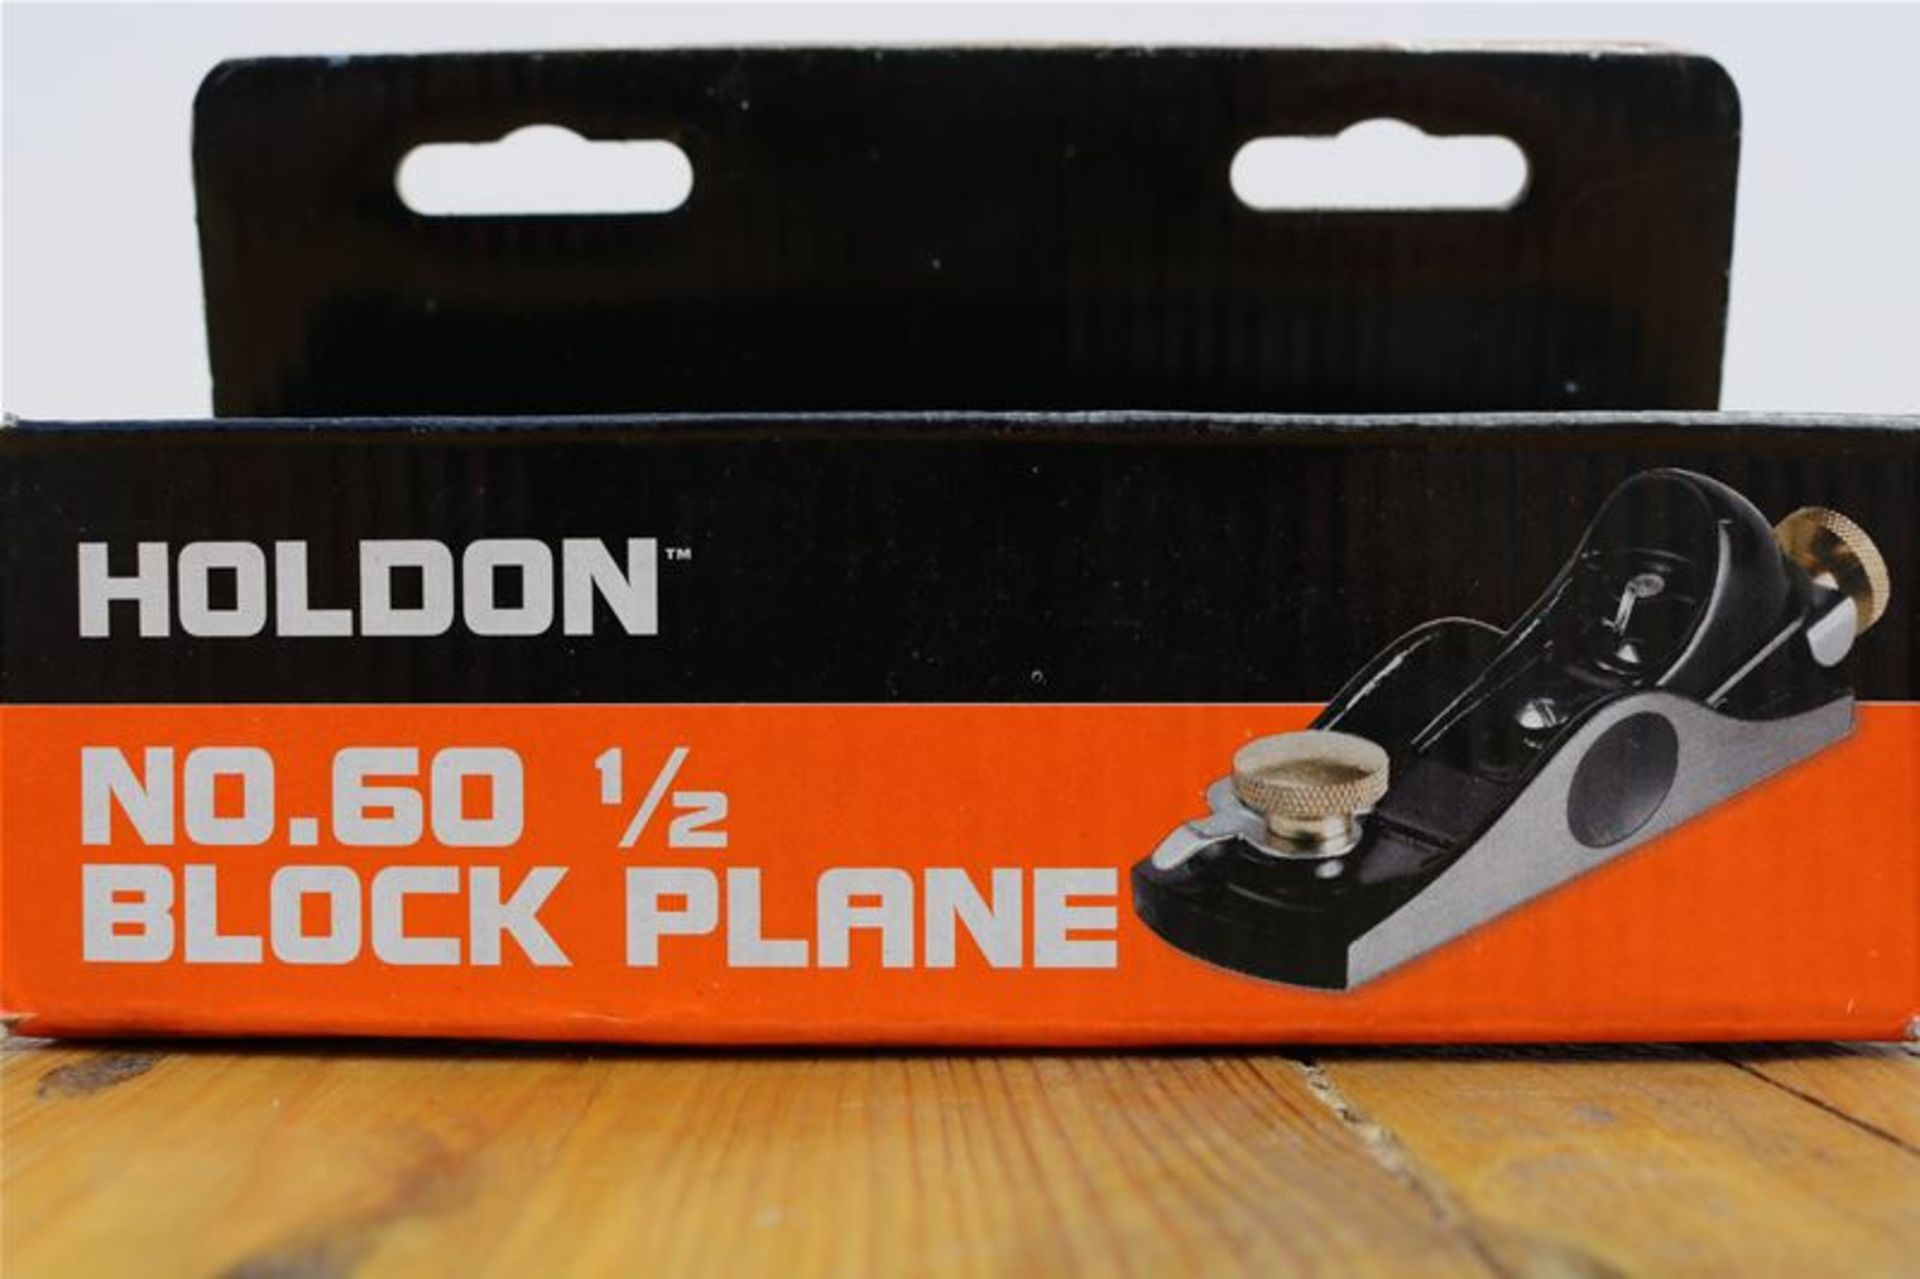 Los 62 - 10 x HOLDON No.60.1/2 Block Plane